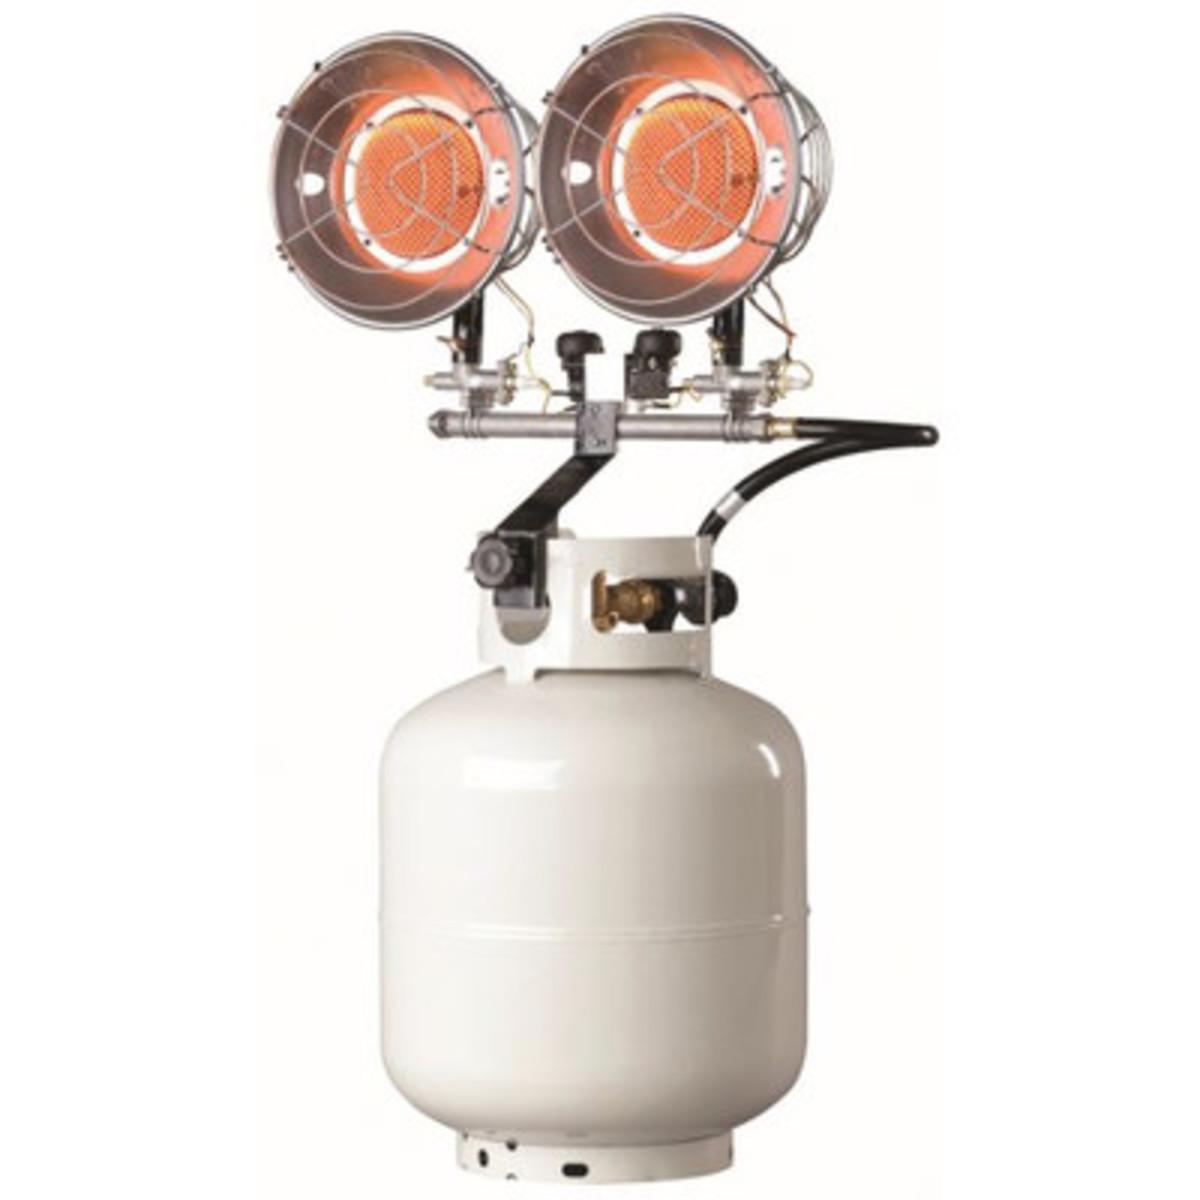 Propane space heater top-mounted to 20-pound propane tank